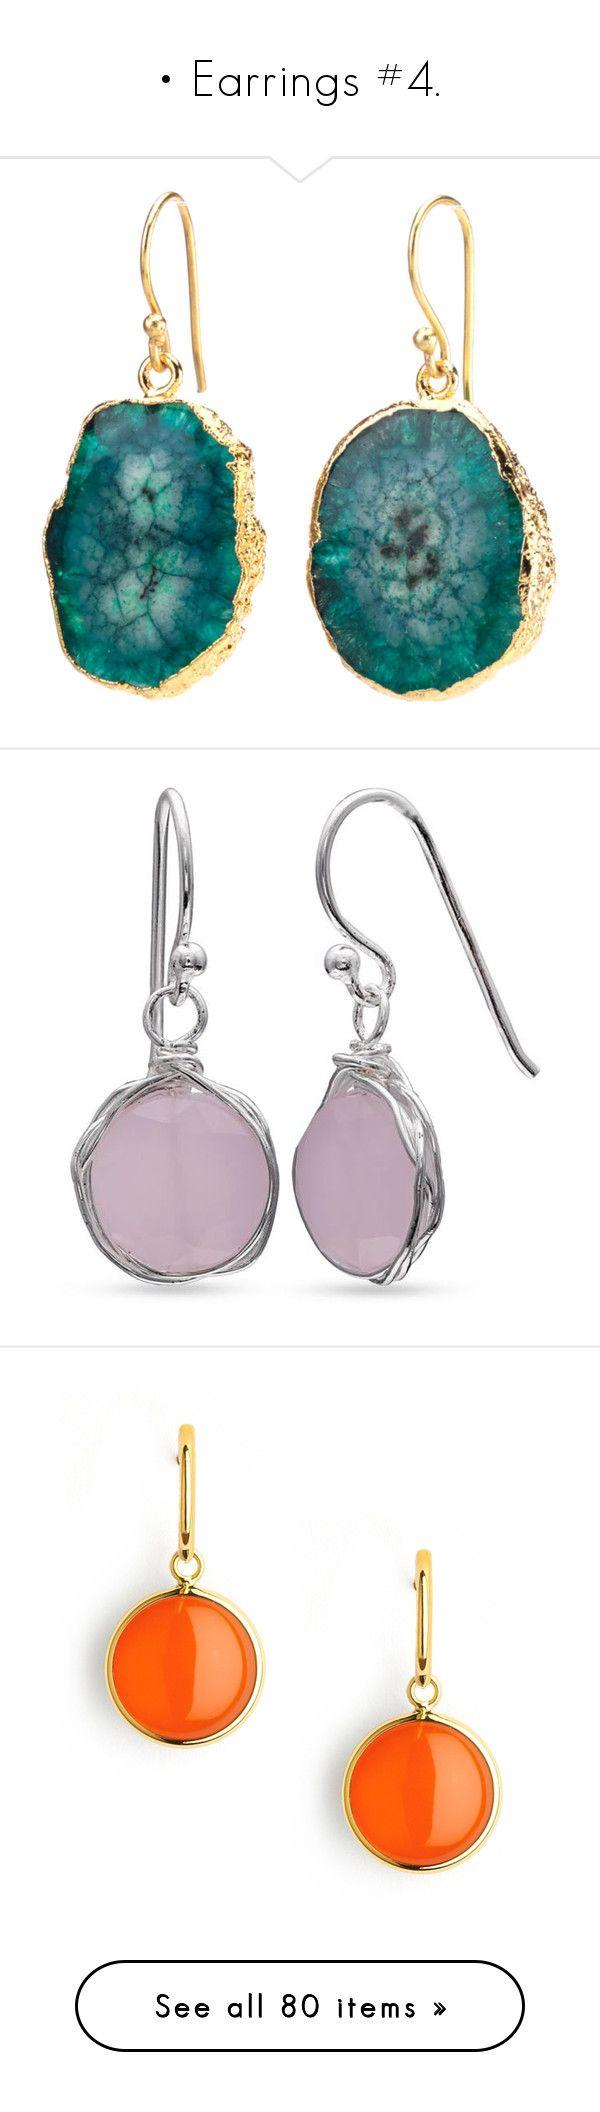 """• Earrings #4."" by krys30rose ❤ liked on Polyvore featuring jewelry, earrings, brinco, hook earrings, agate earrings, dangle earrings, long earrings, nickel free earrings, pastel pink and pink drop earrings"